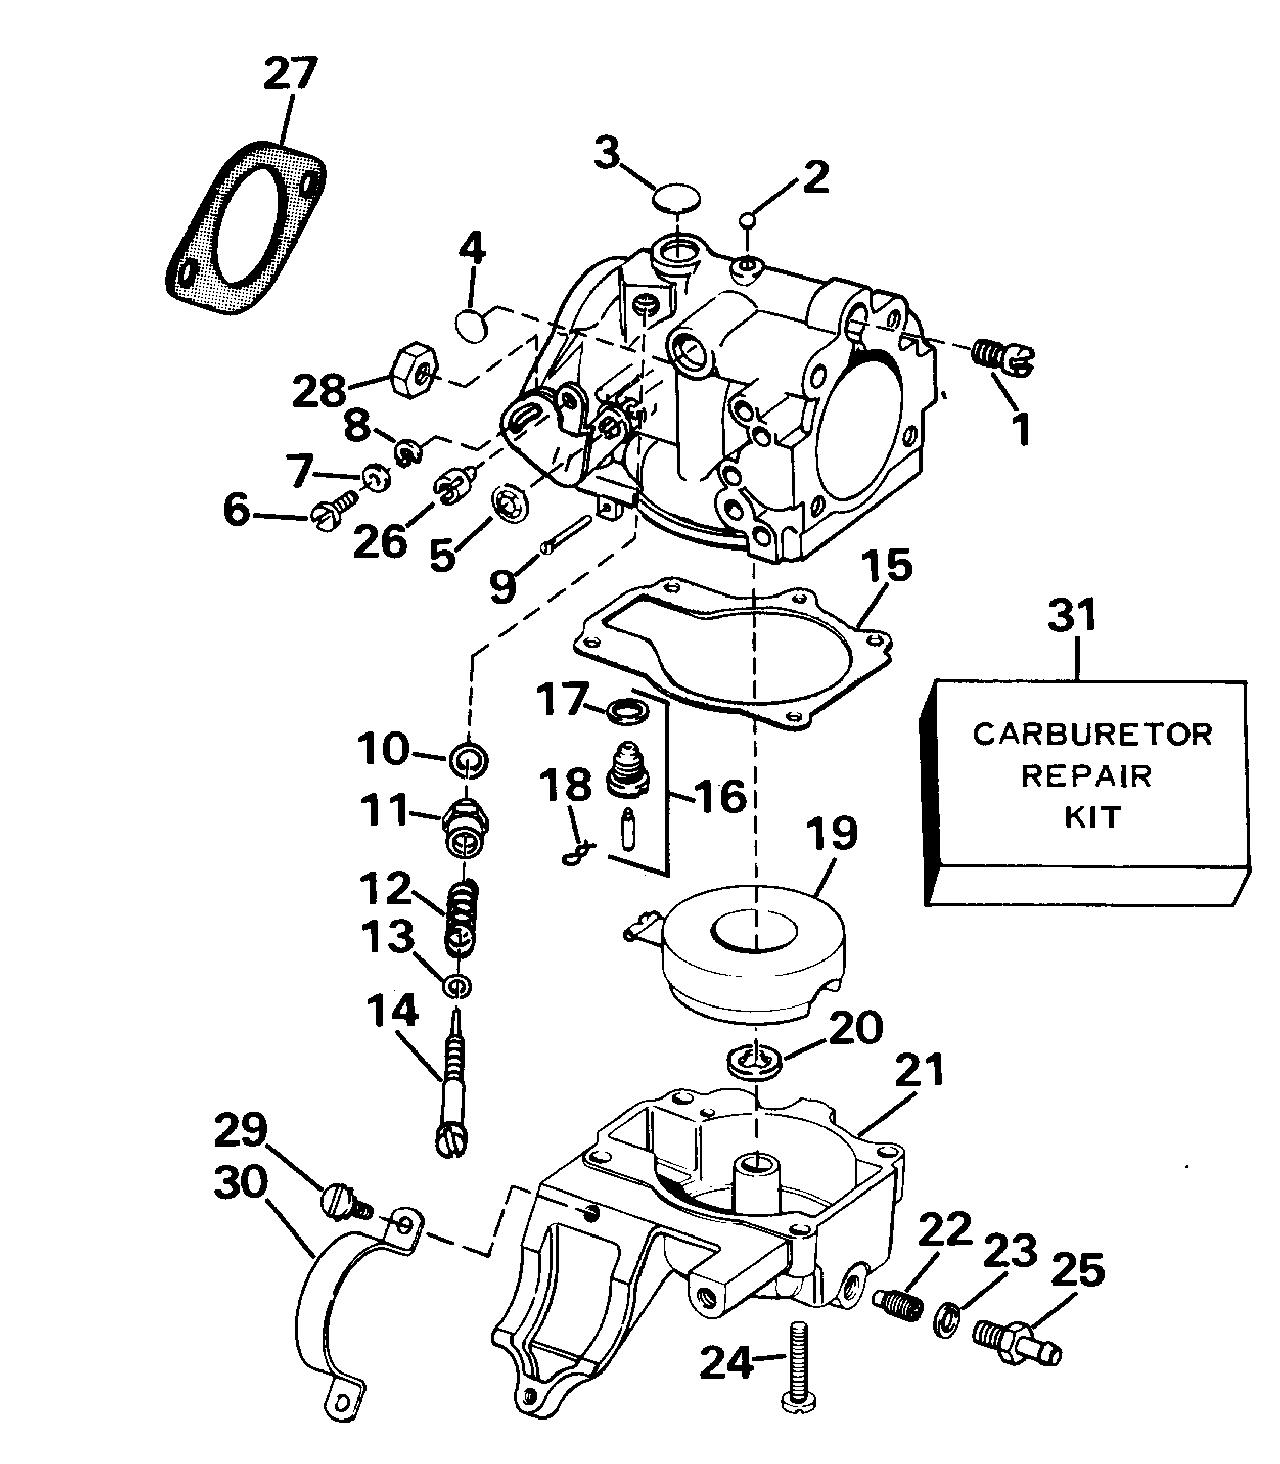 1989 johnson 40hp tjelcec manual